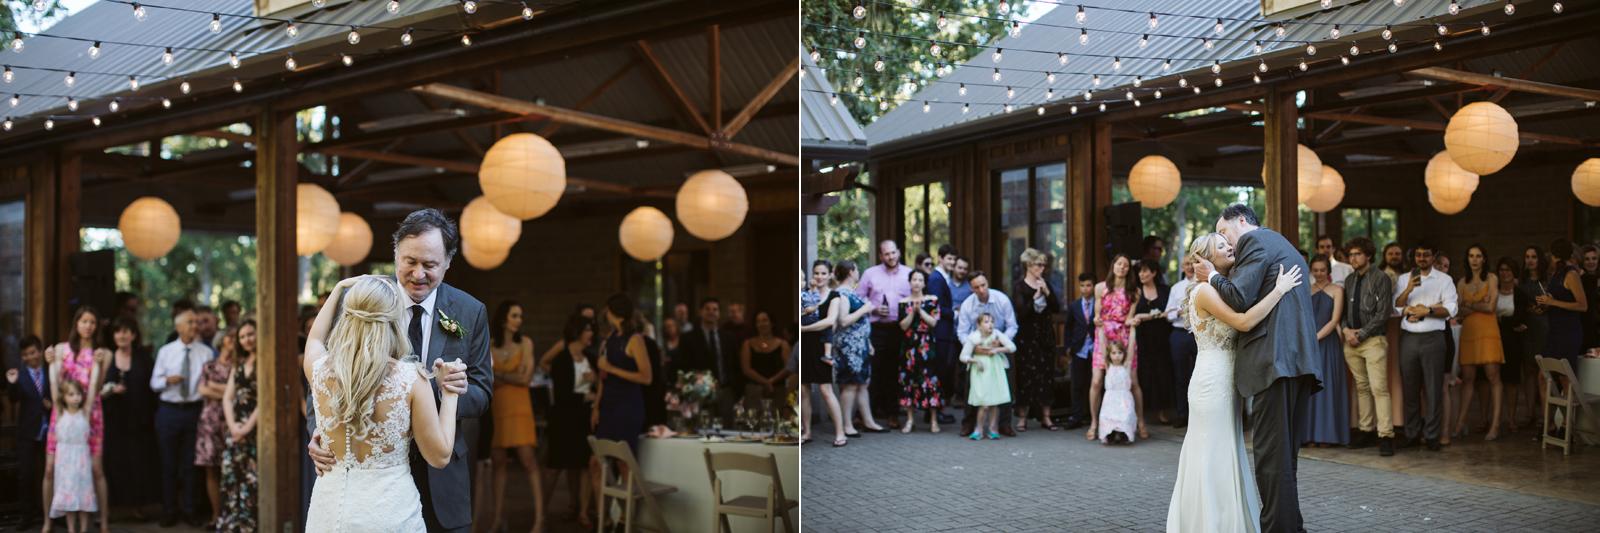 111-daronjackson-rachel-michael-wedding-mtpisgah.jpg